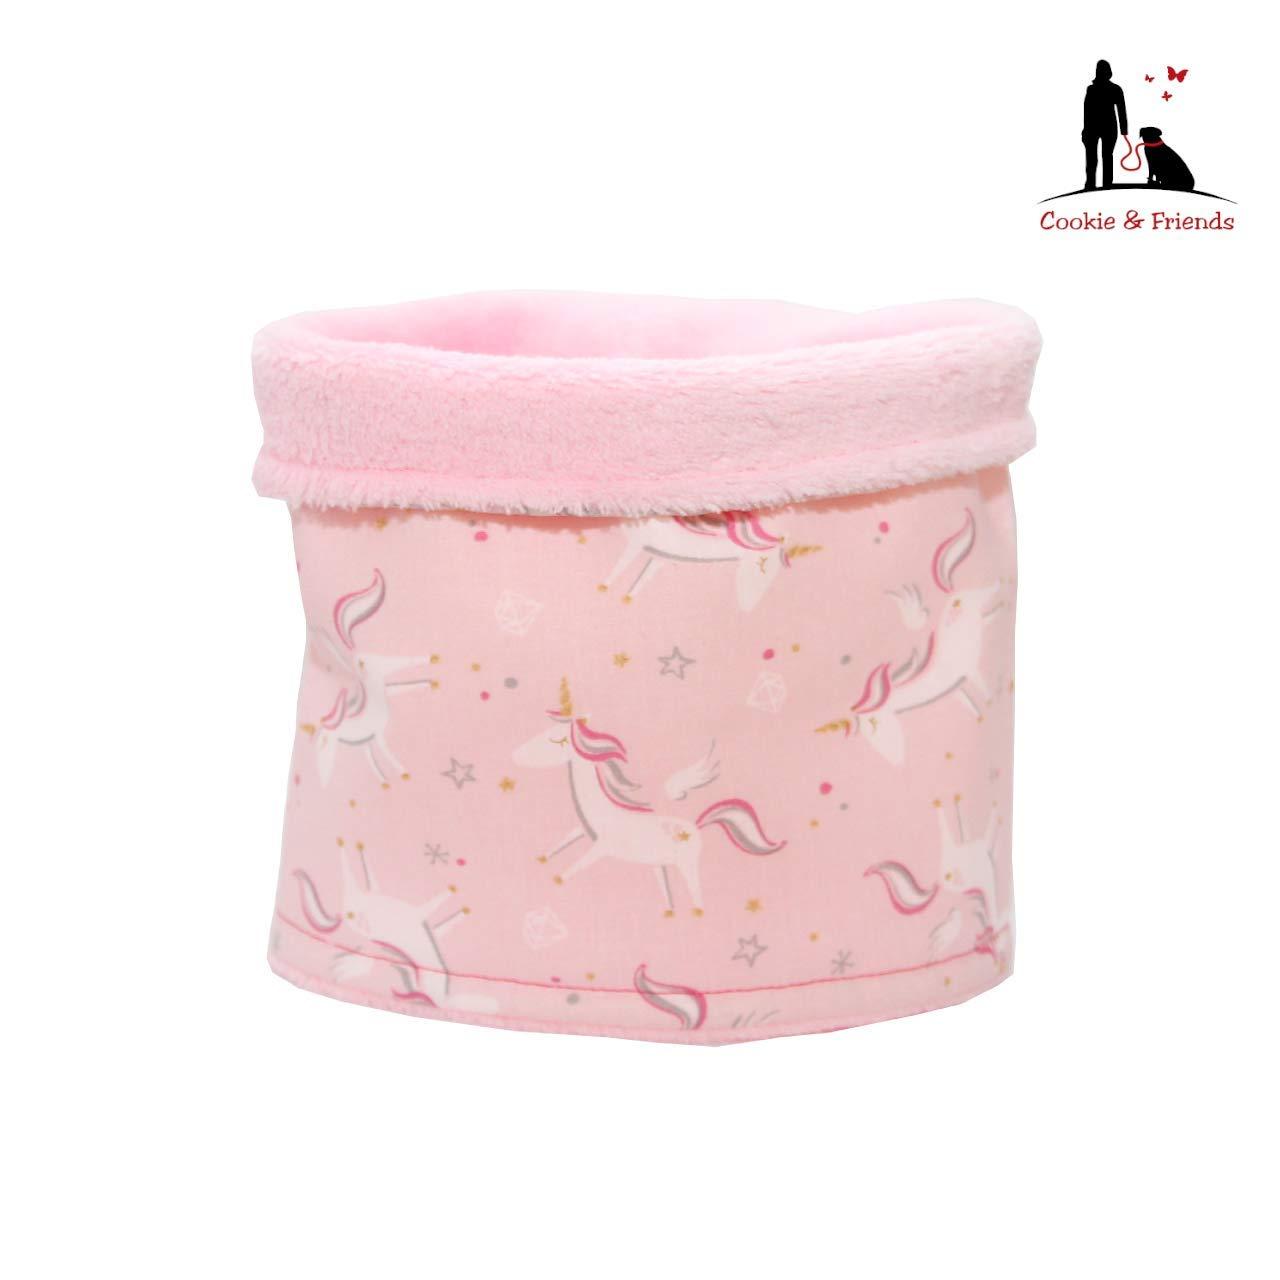 HundeloopUnicorn, Schal für Hunde, wunderbar warm und weich HundeloopUnicorn Schal für Hunde